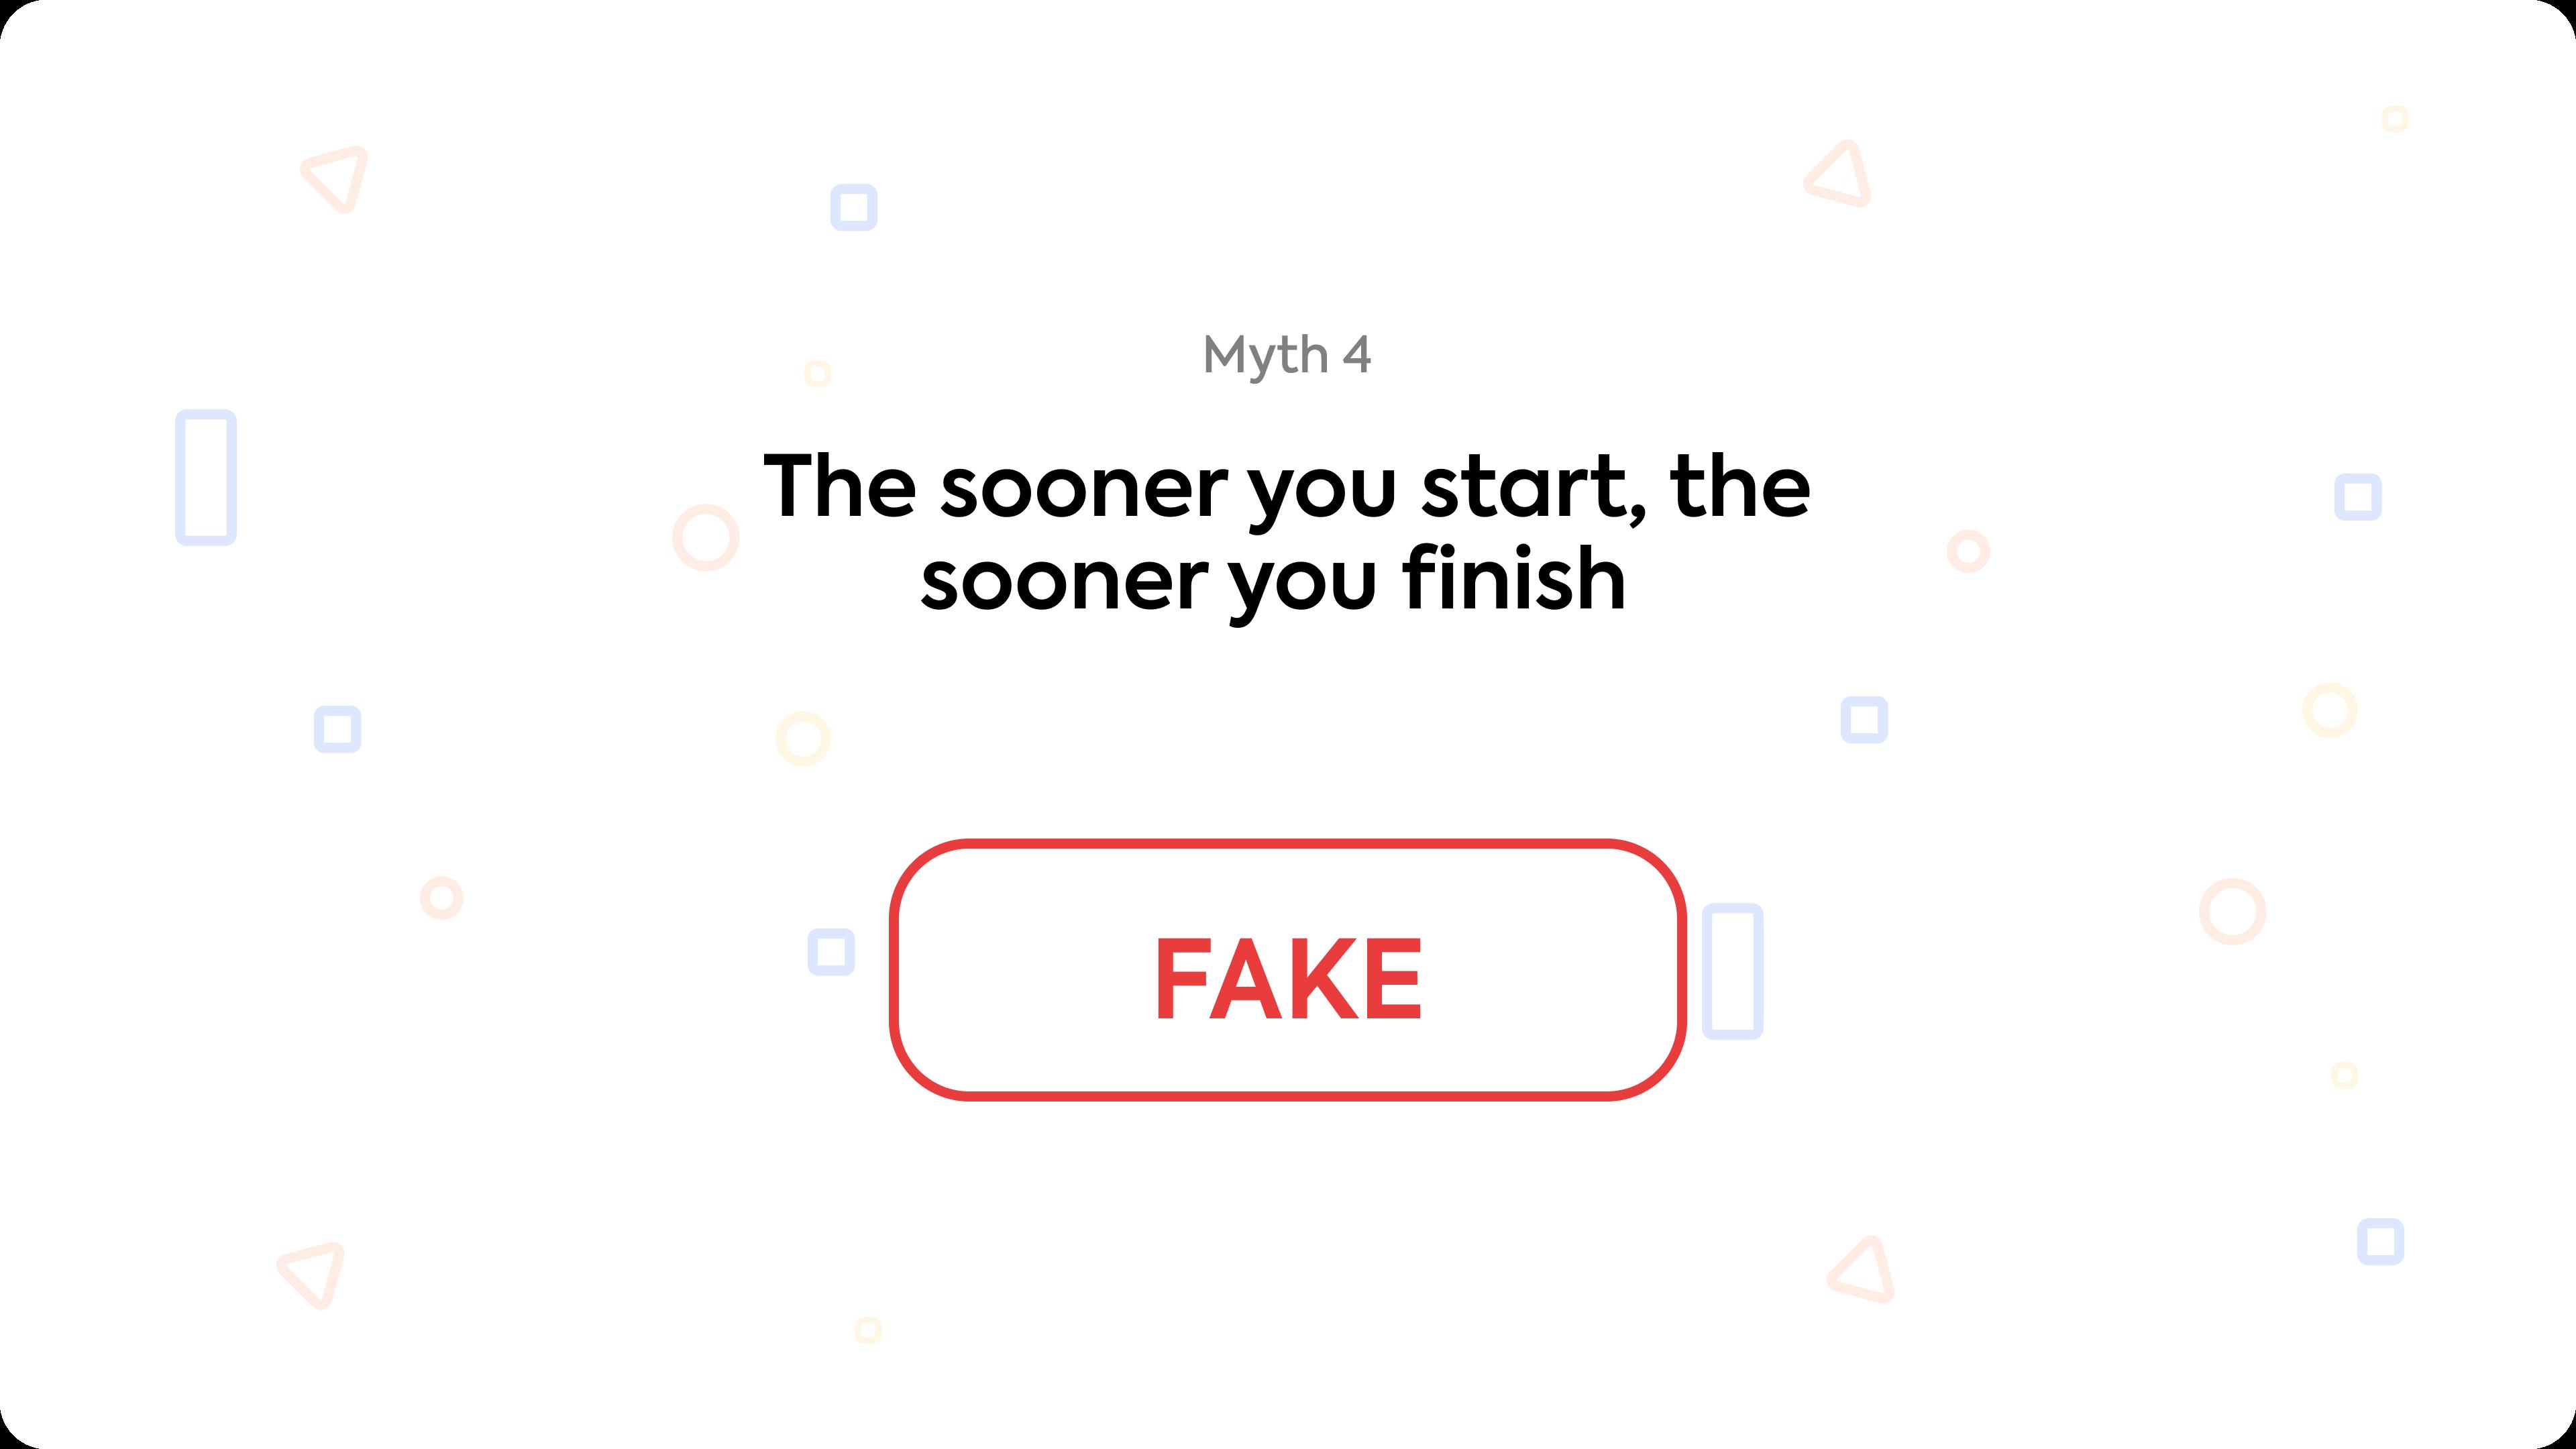 Myth 4: The sooner you start, the sooner you finish